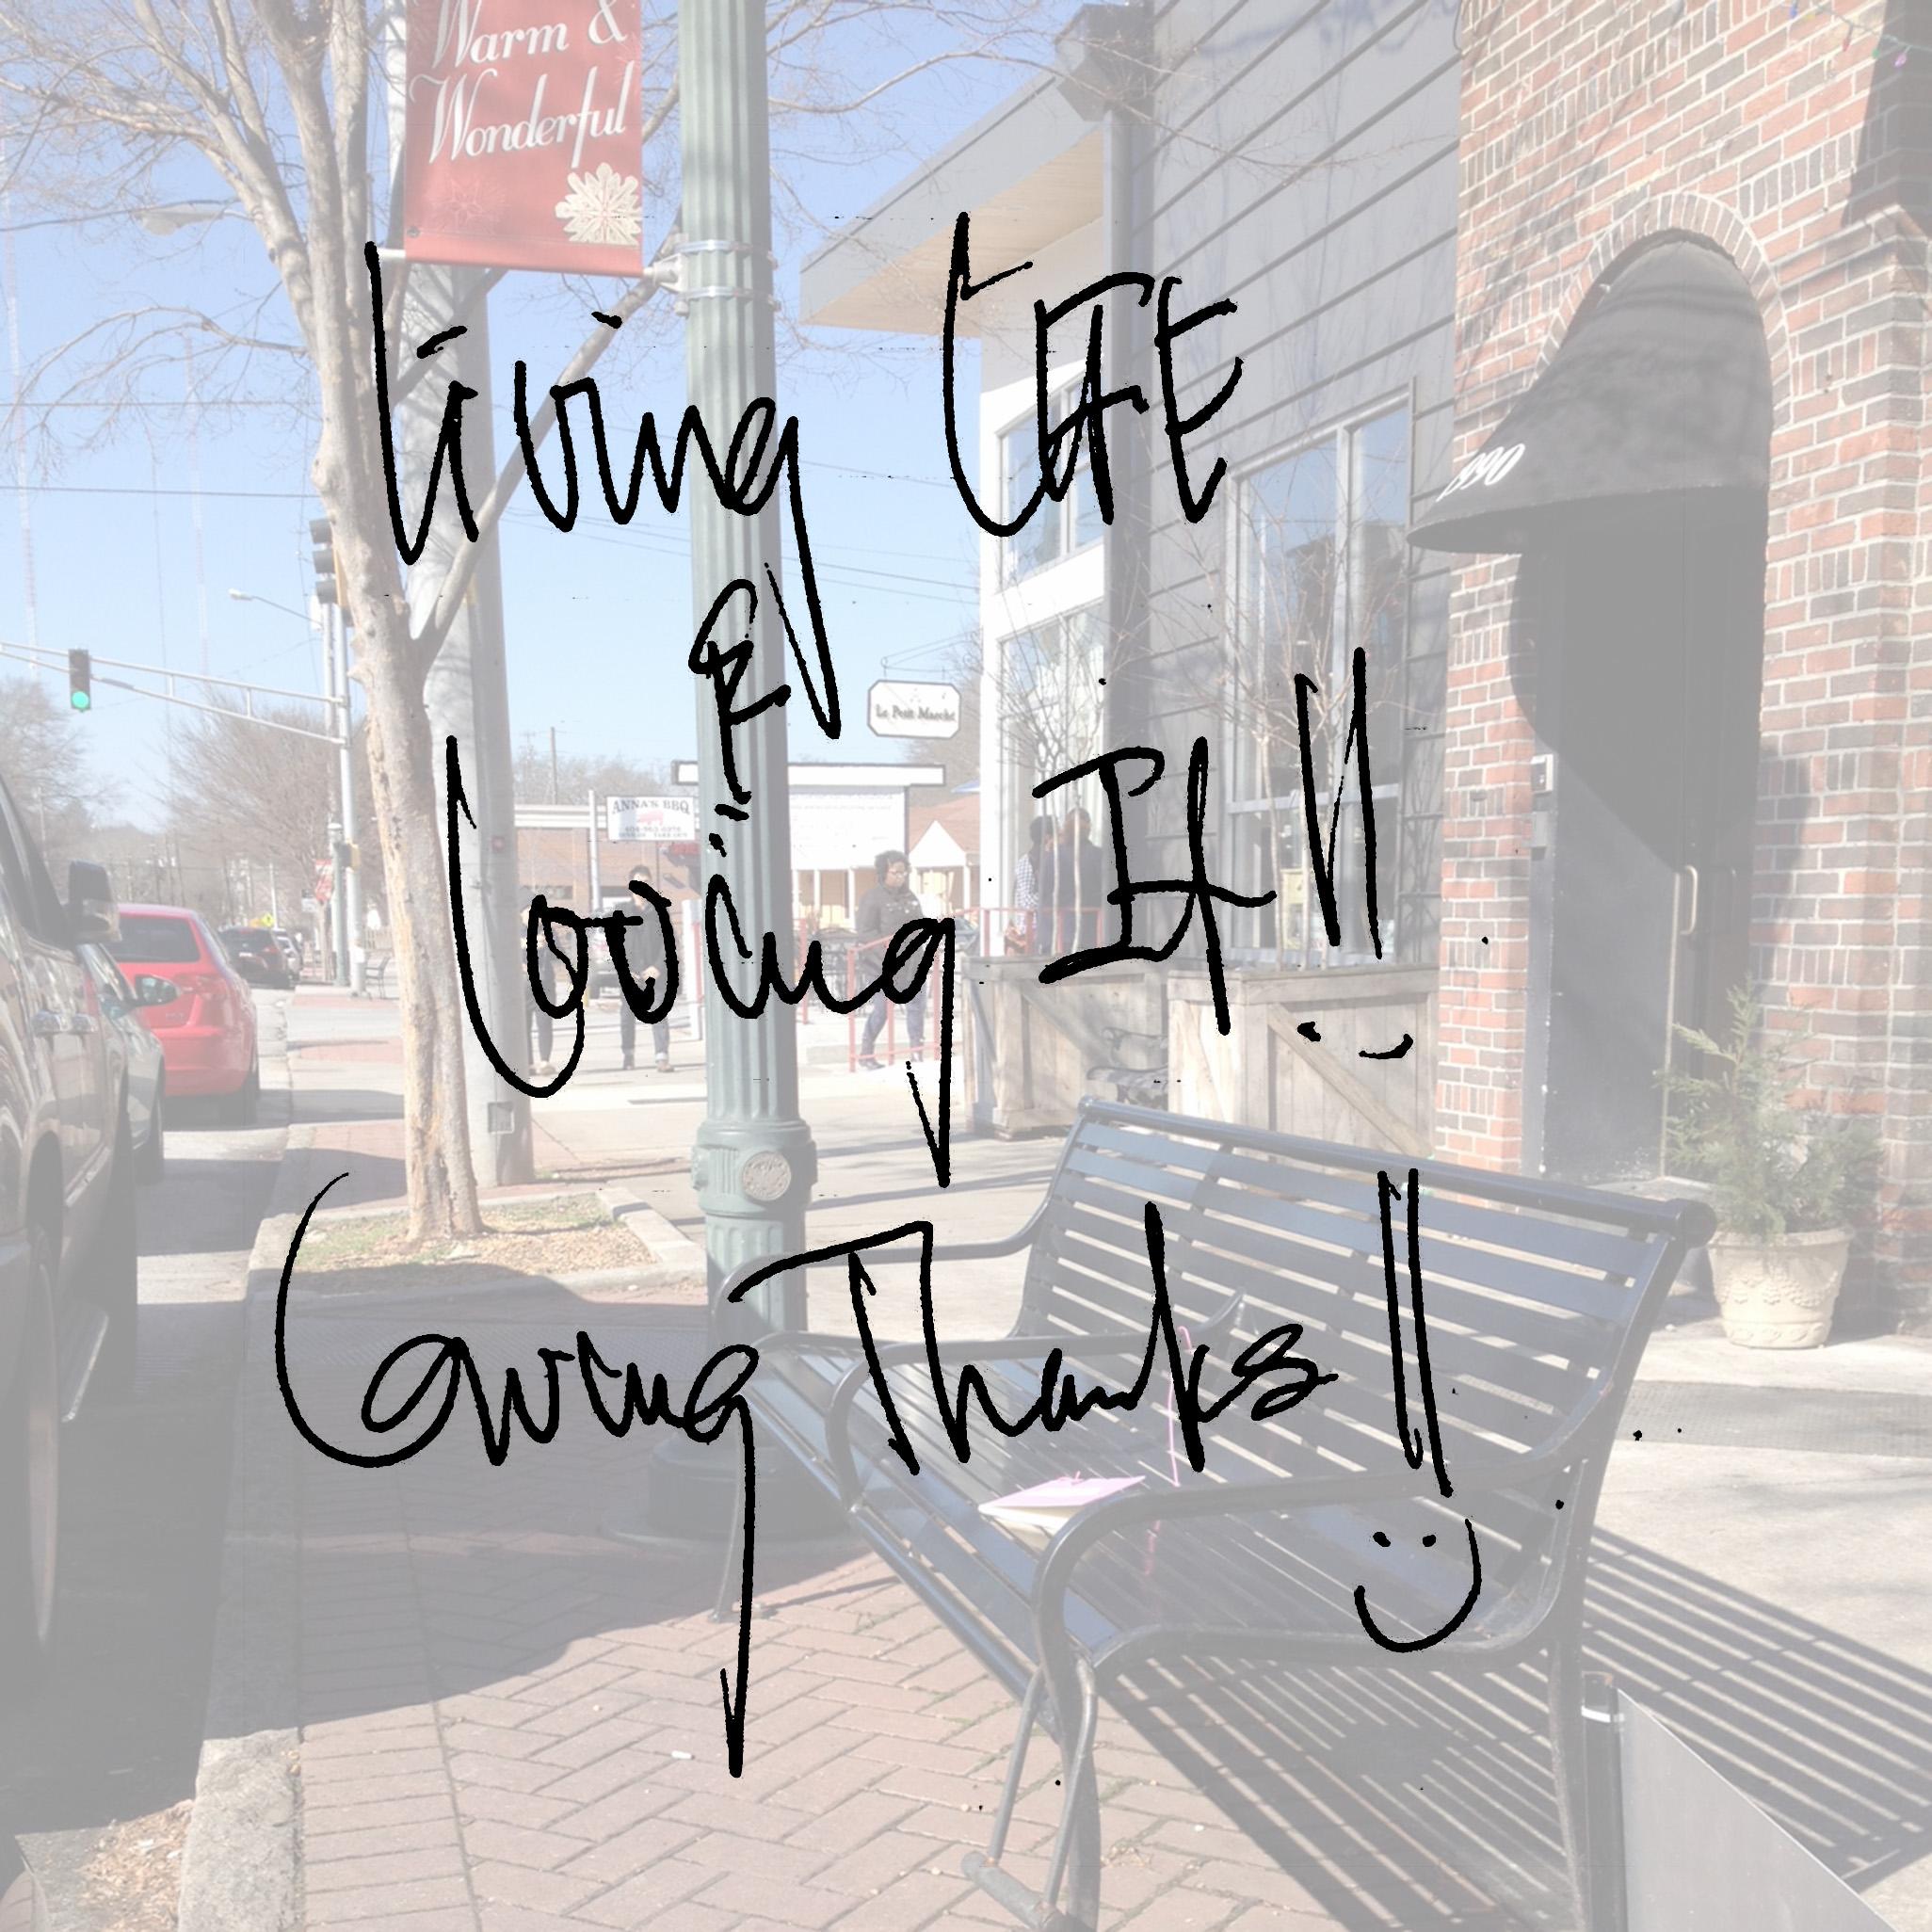 Living life & loving it! Giving thanks!